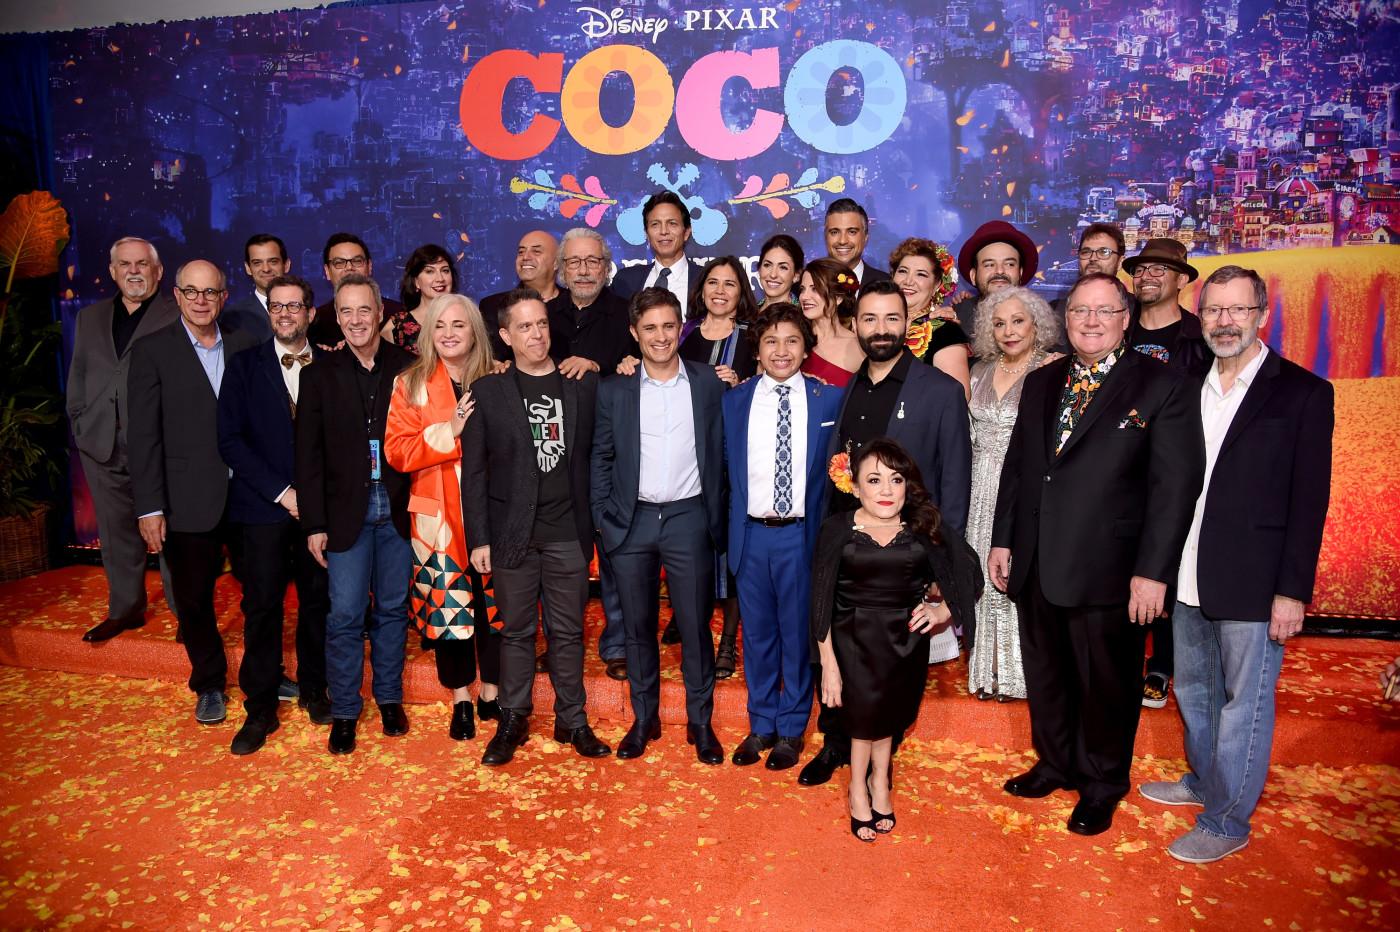 Premiere Of Disney Pixar's 'Coco' - Red Carpet